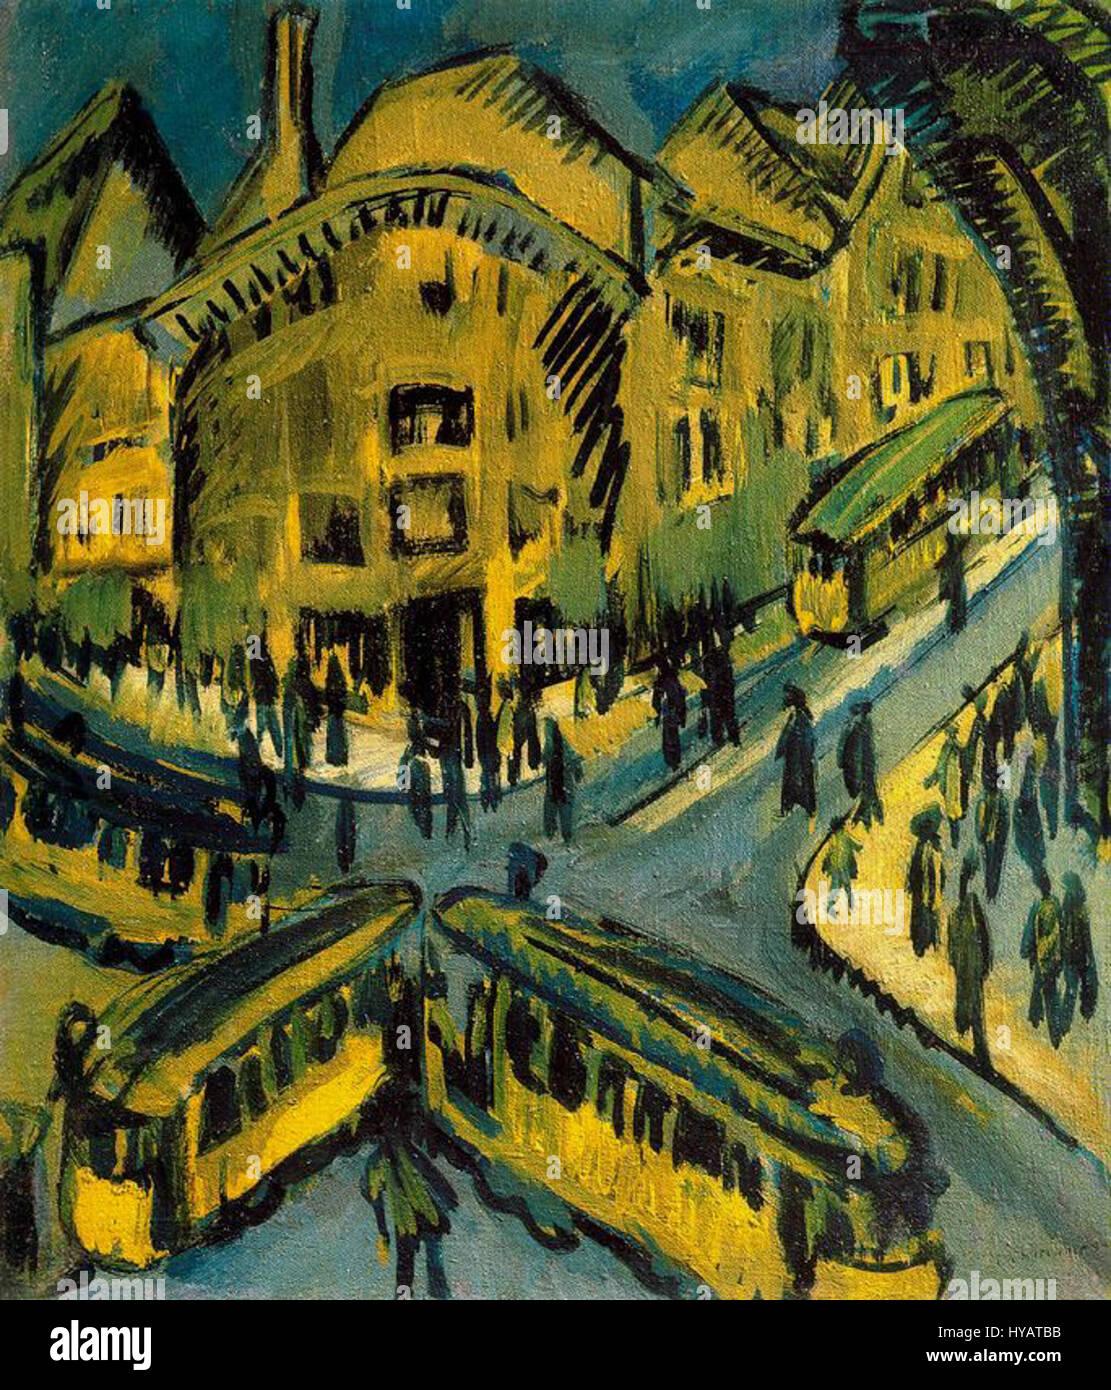 Ernst Ludwig Kirchner   Nollendorfplatz - Stock Image